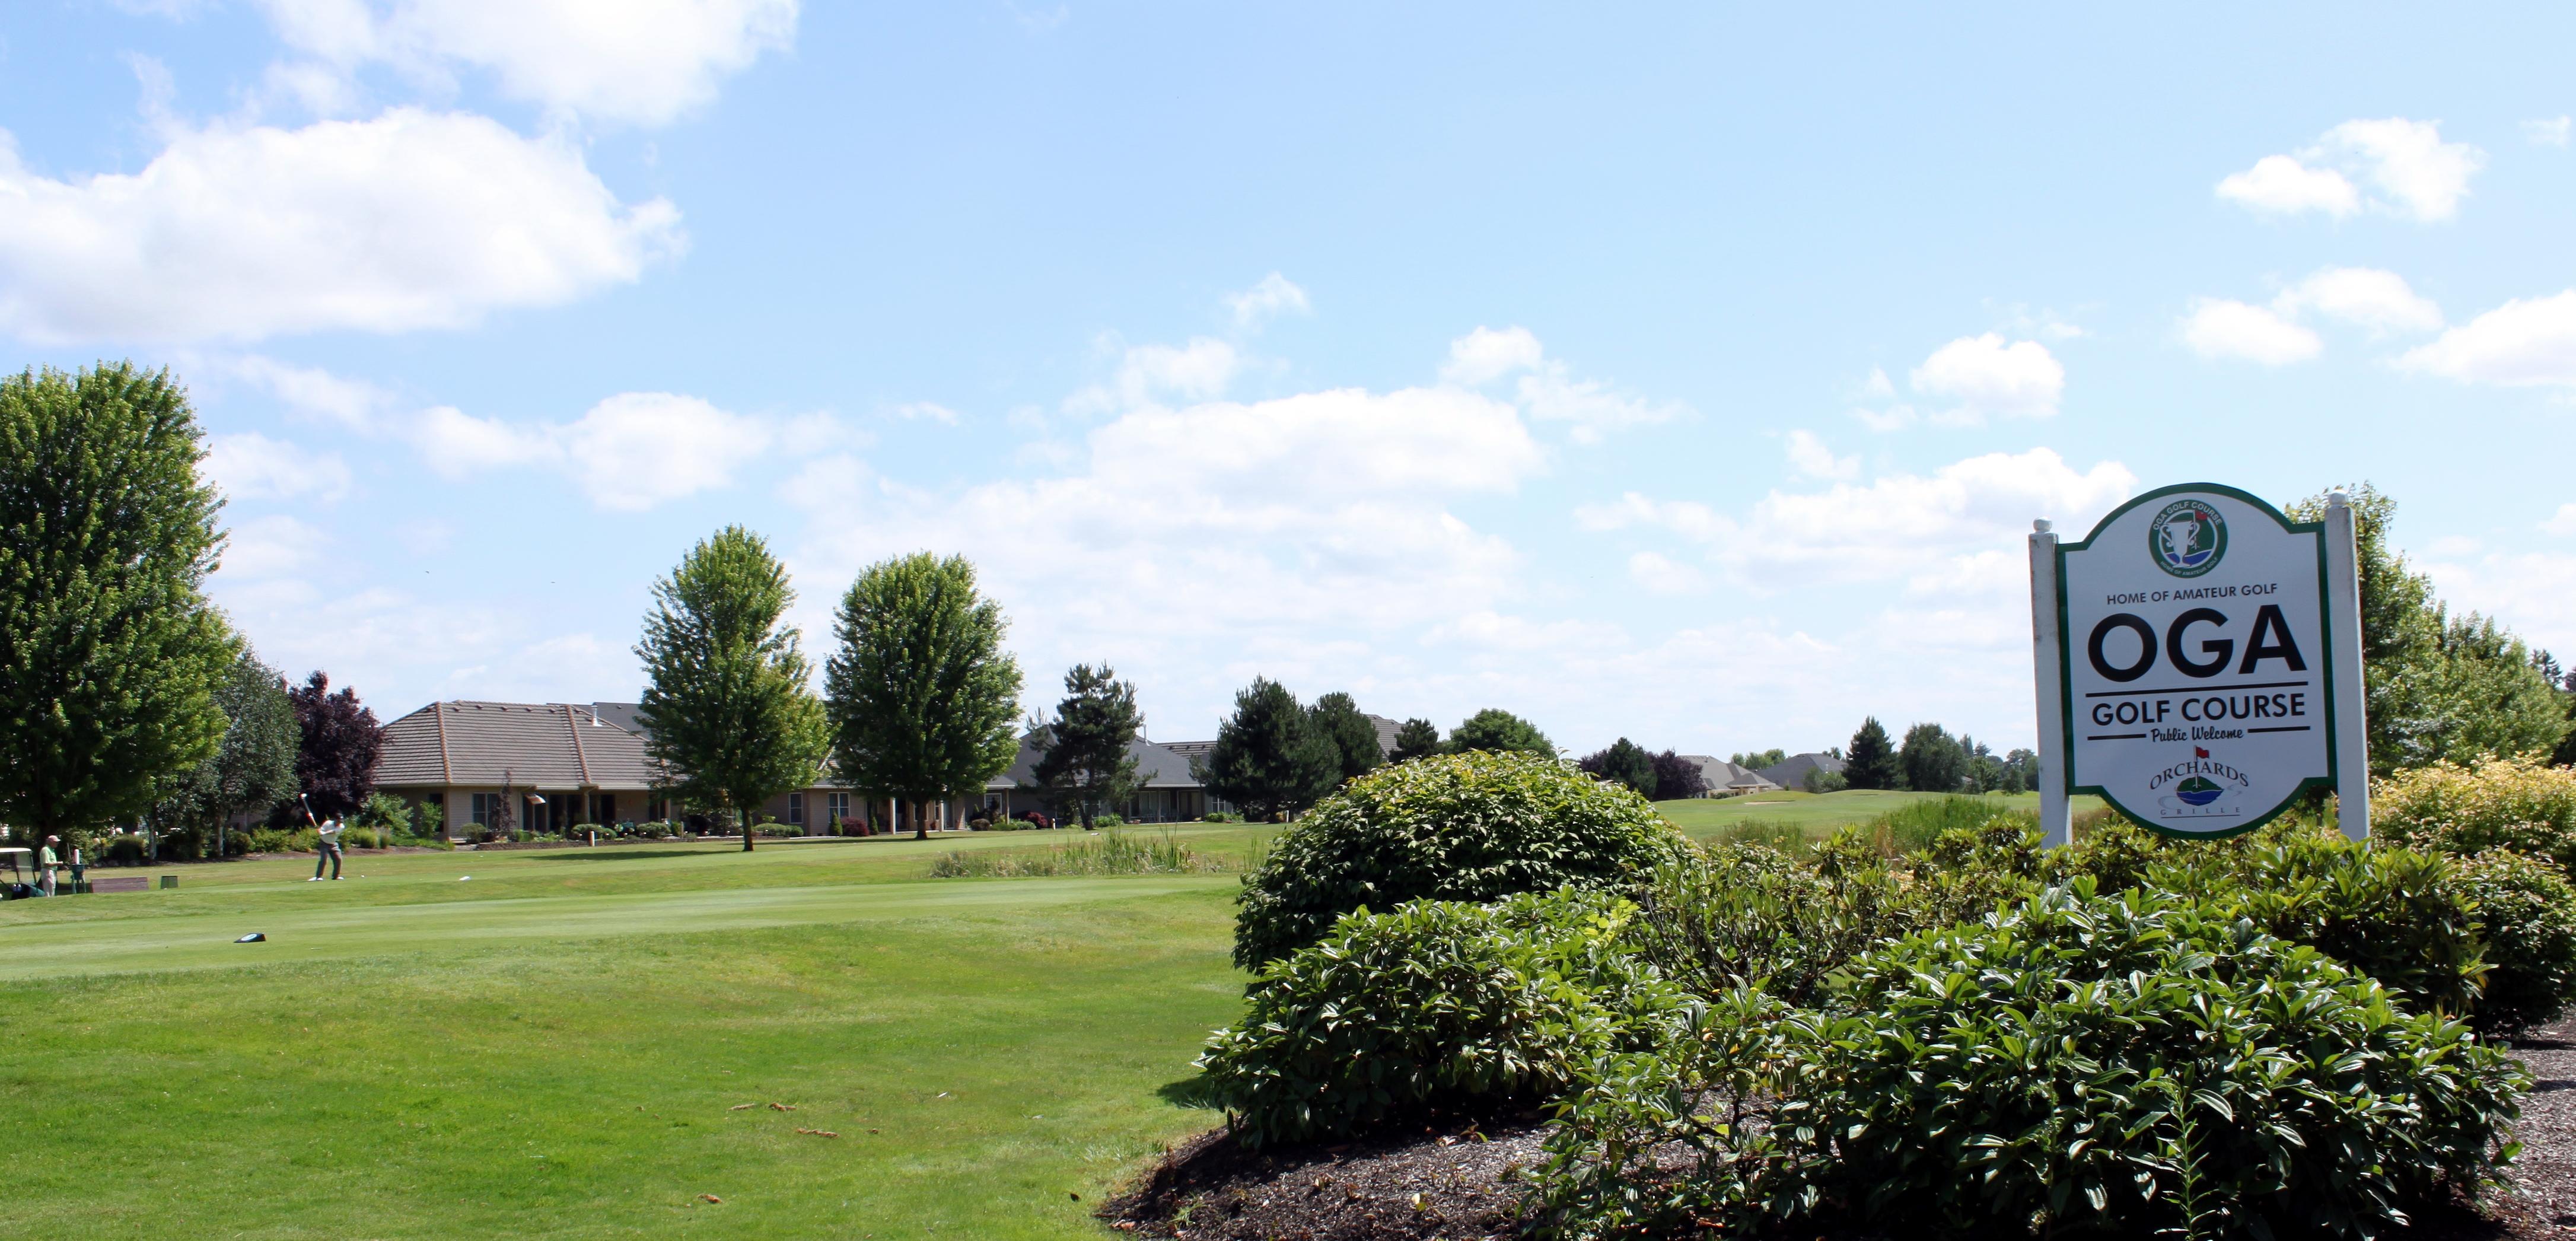 OGA Golf Course